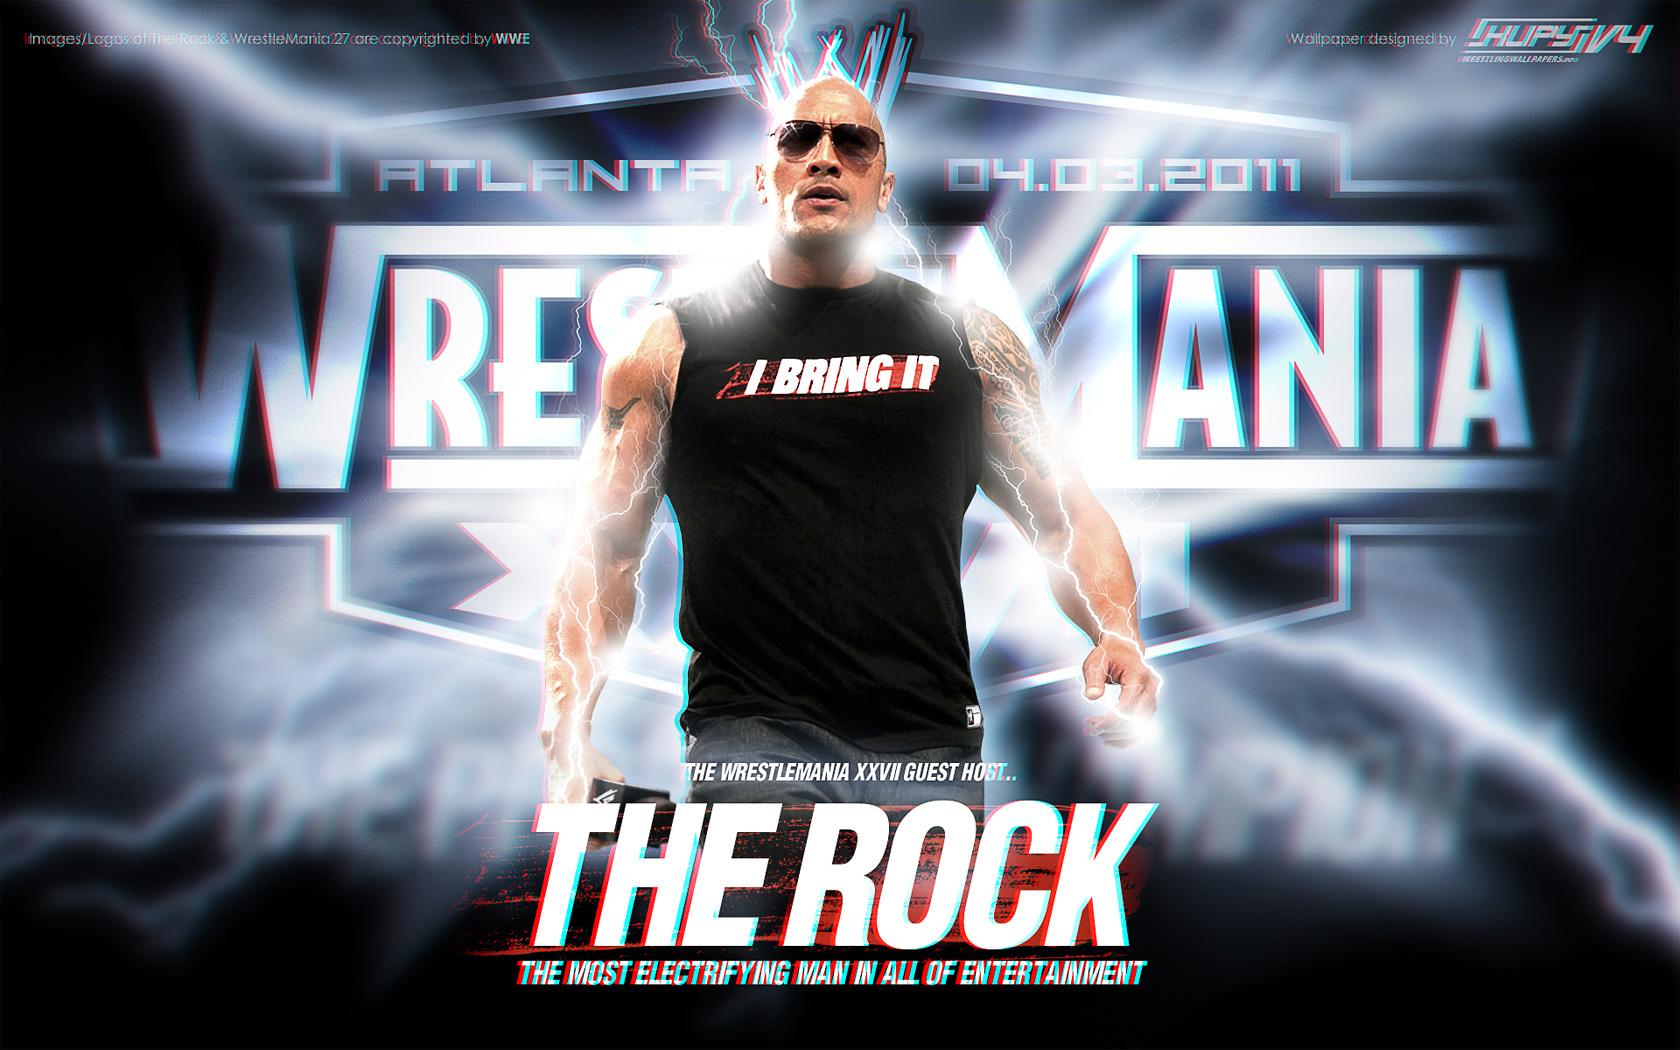 Wwe Wallpapers 2012 3d New Wrestlemania 27 The Rock Wallpaper Kupy Wrestling